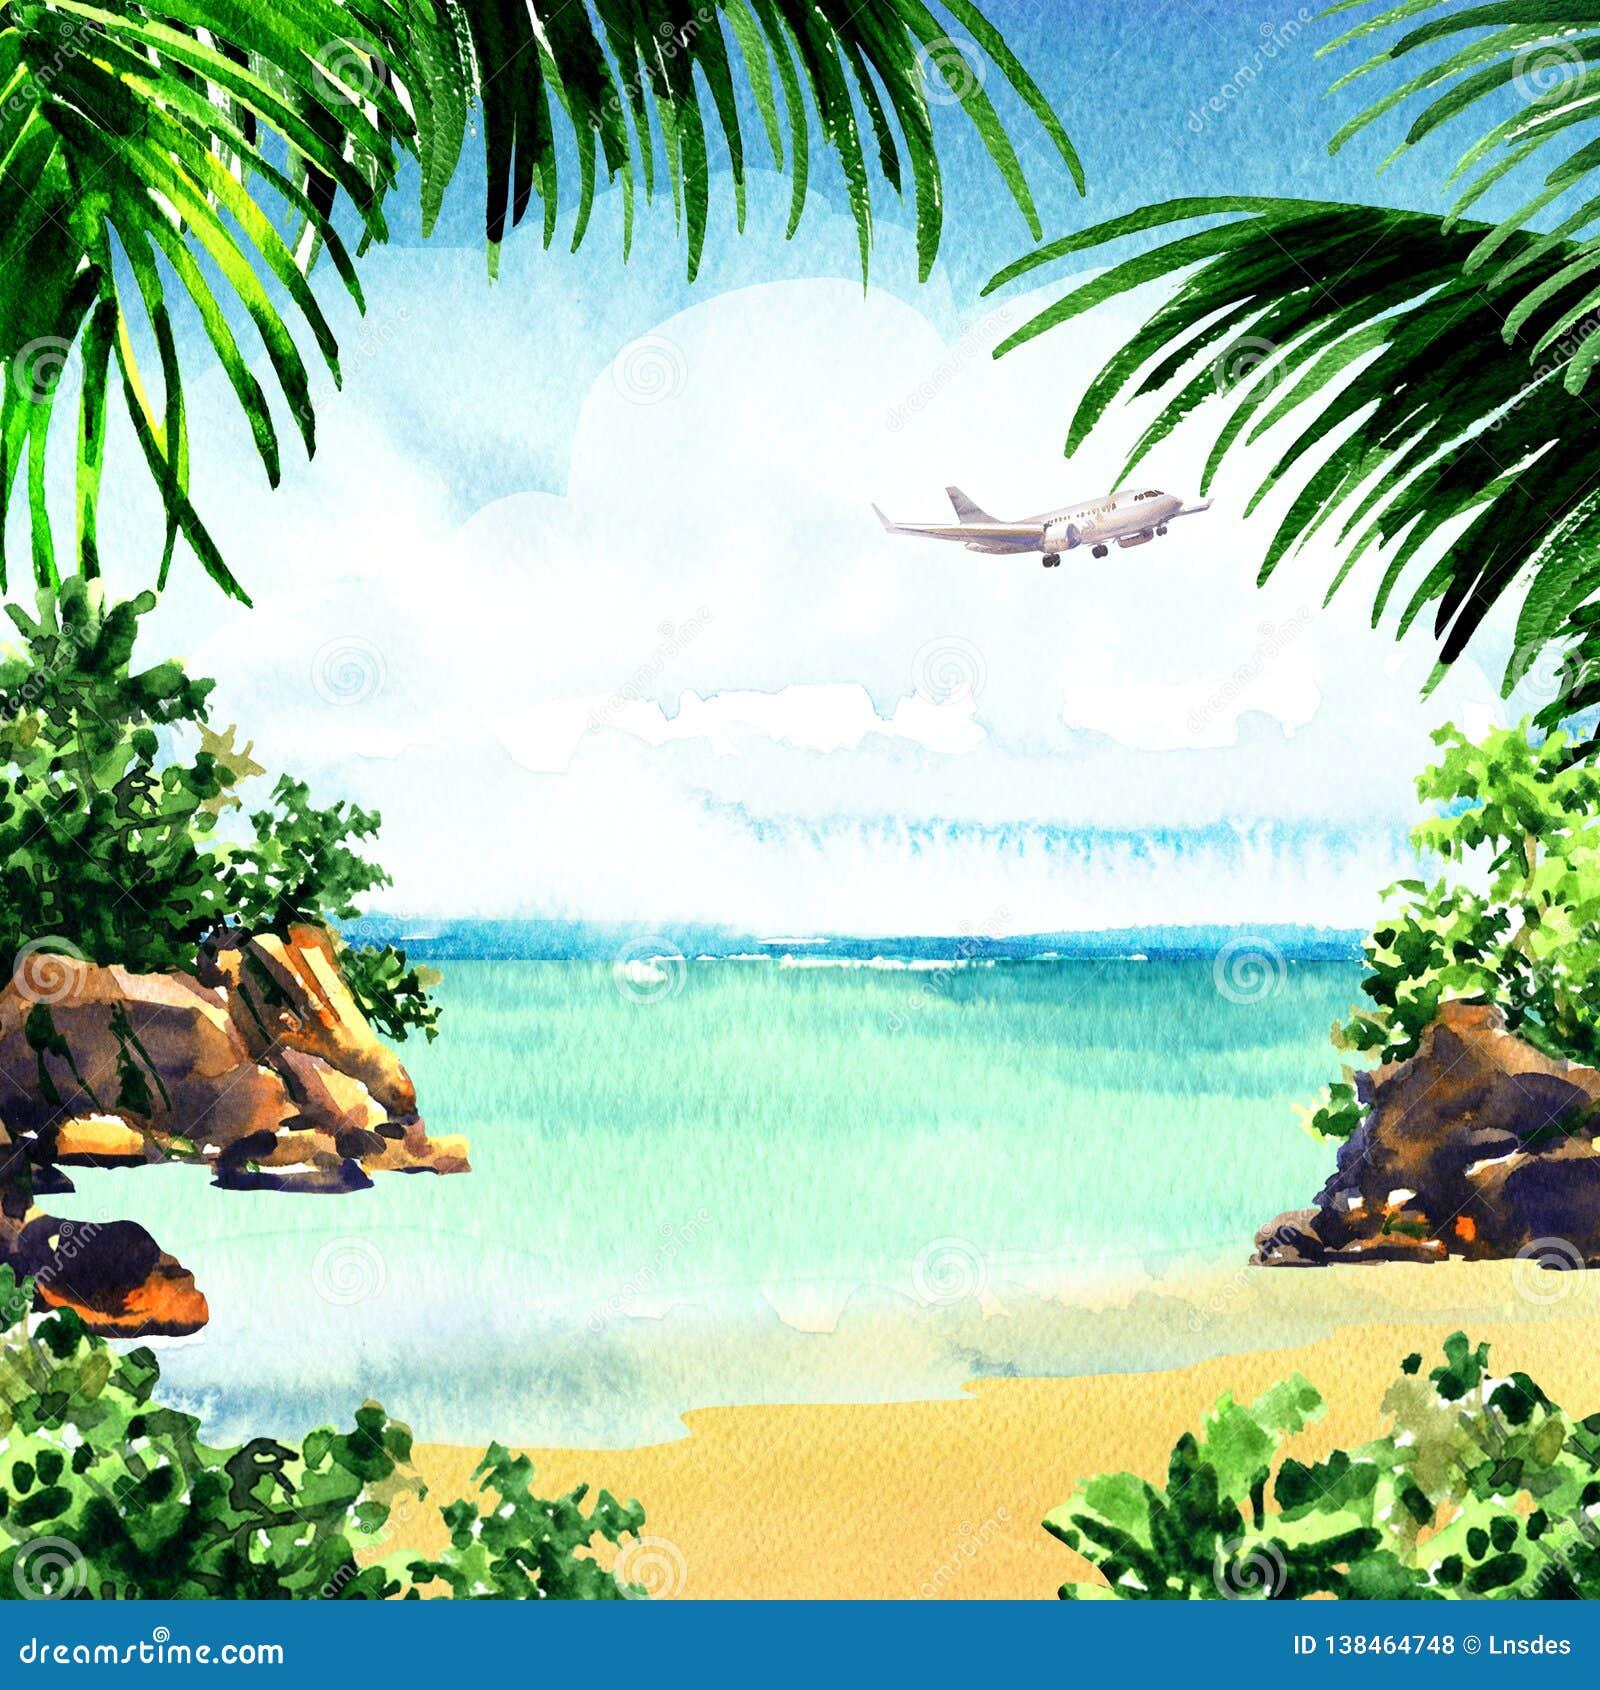 Tropical Island Paradise: Beautiful Paradise Tropical Island With Tropical Beach